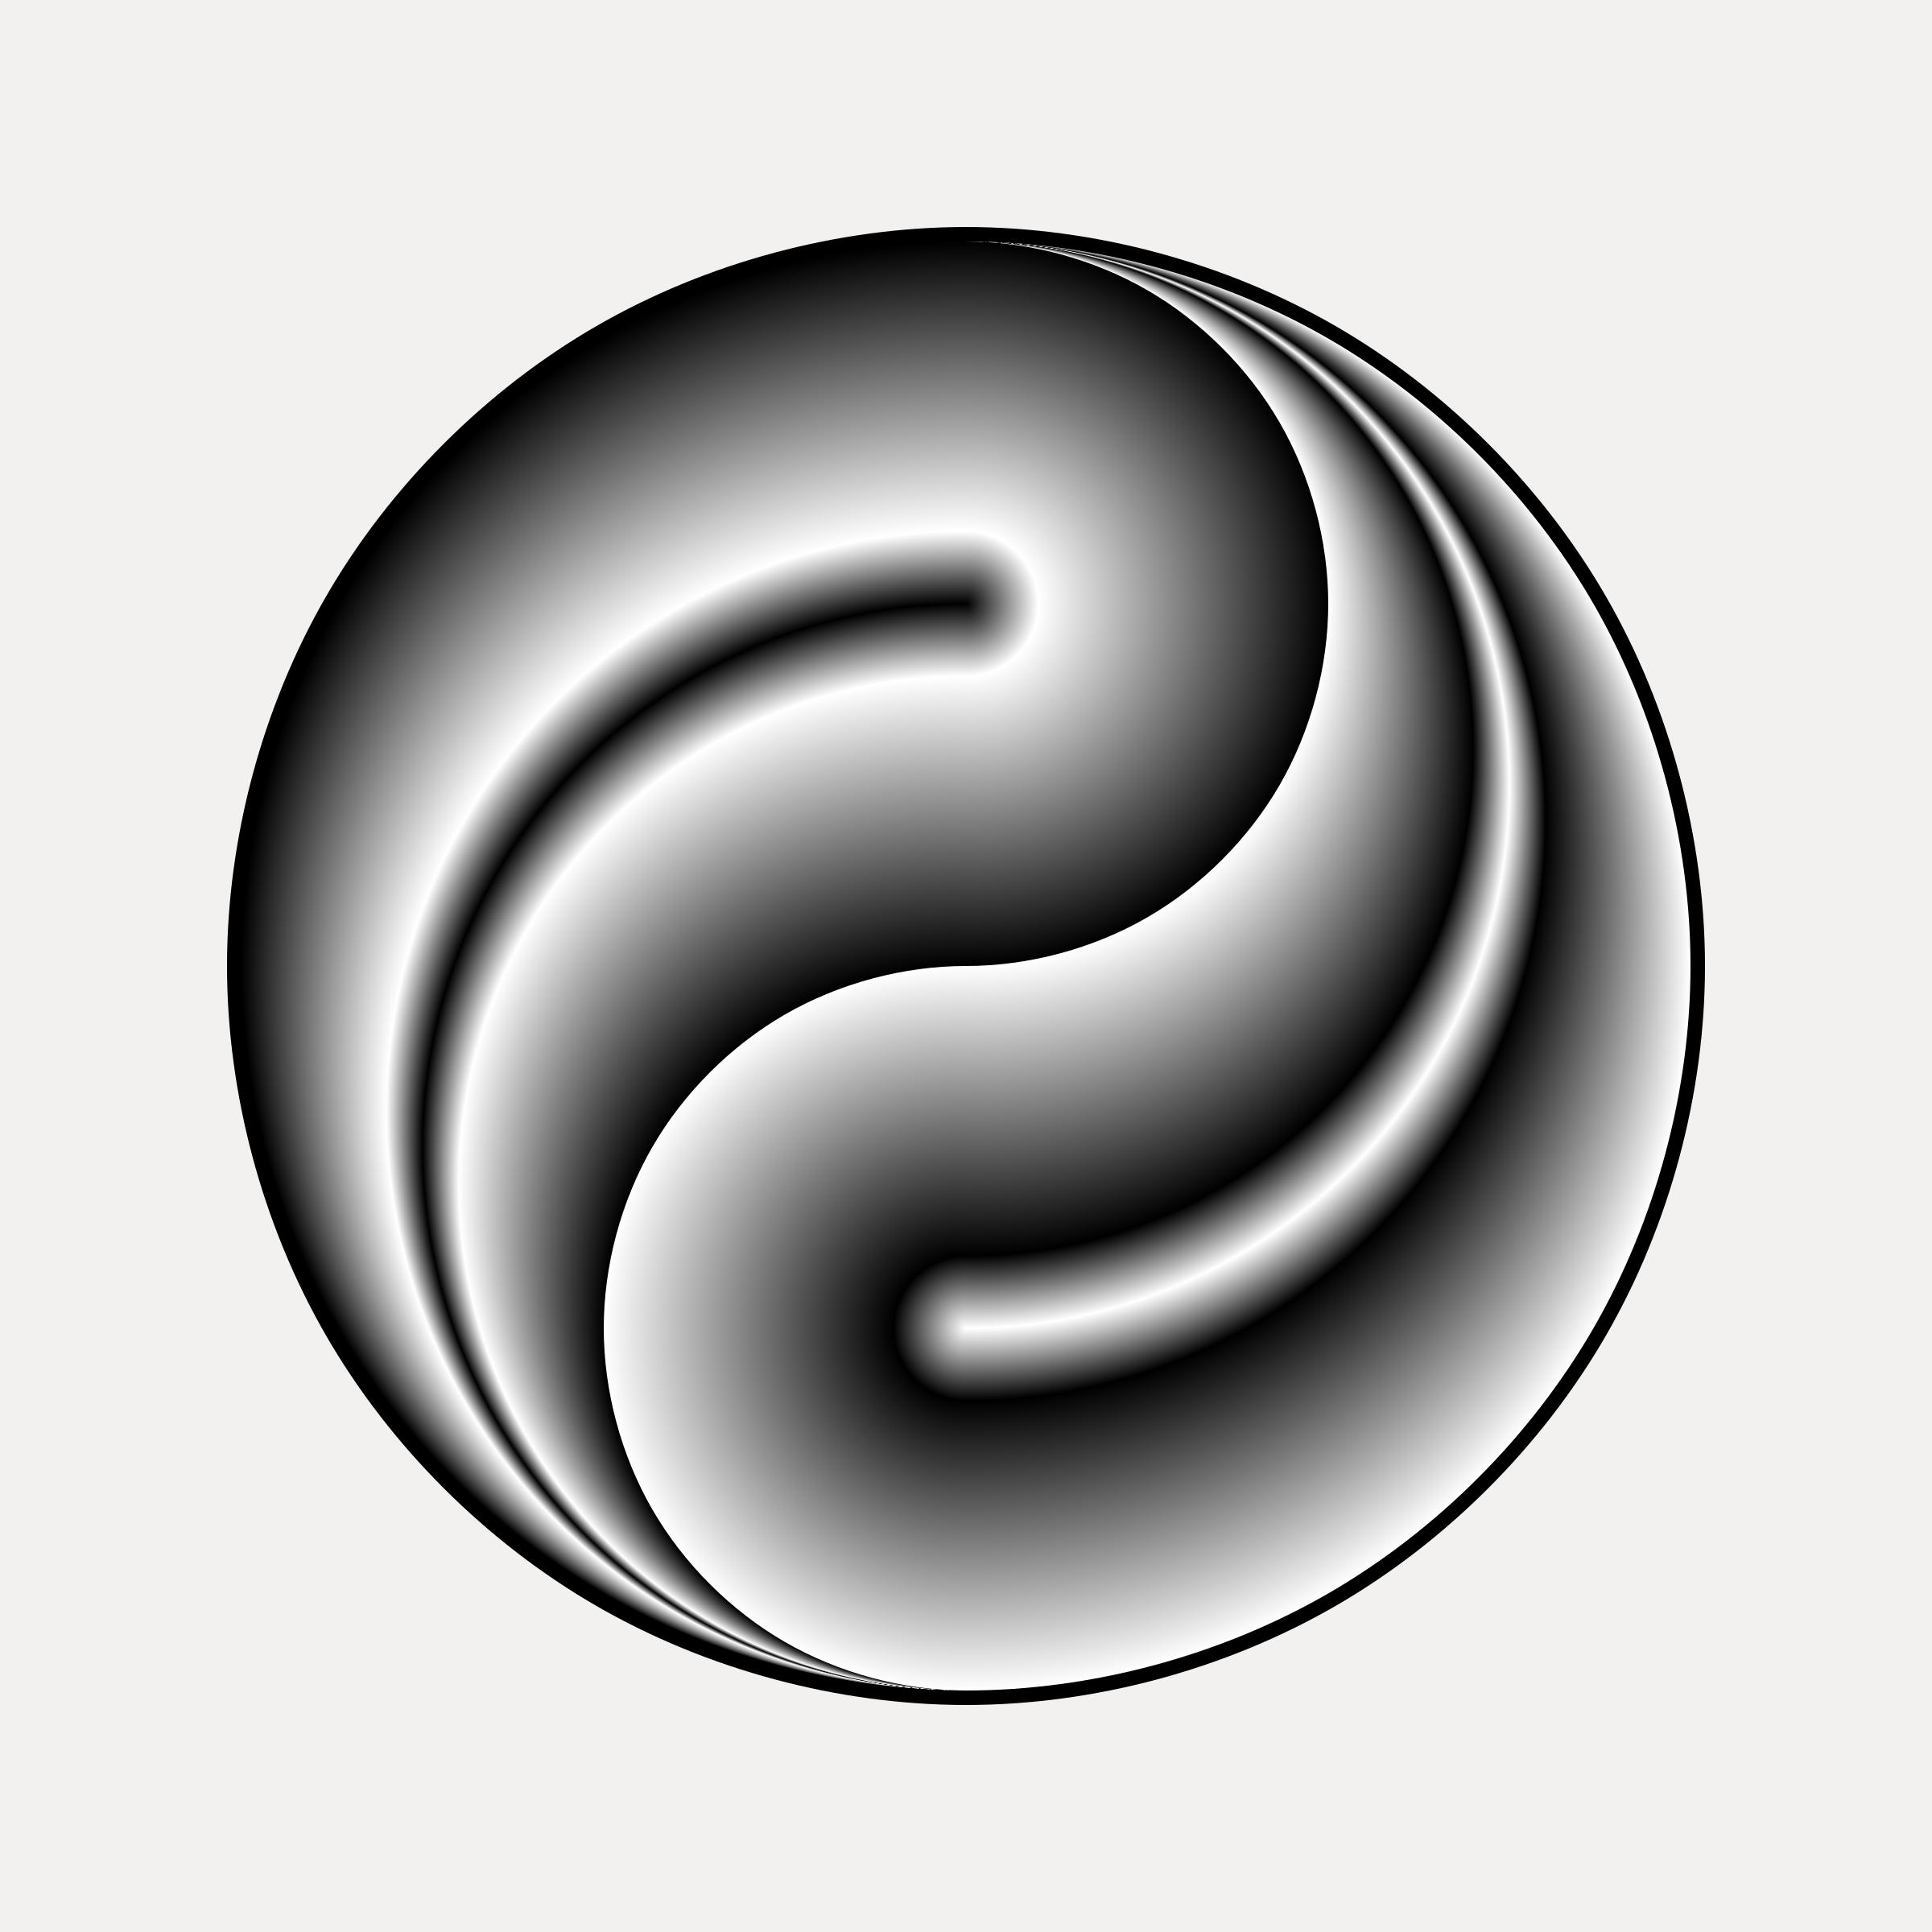 Clipart yin yang 3